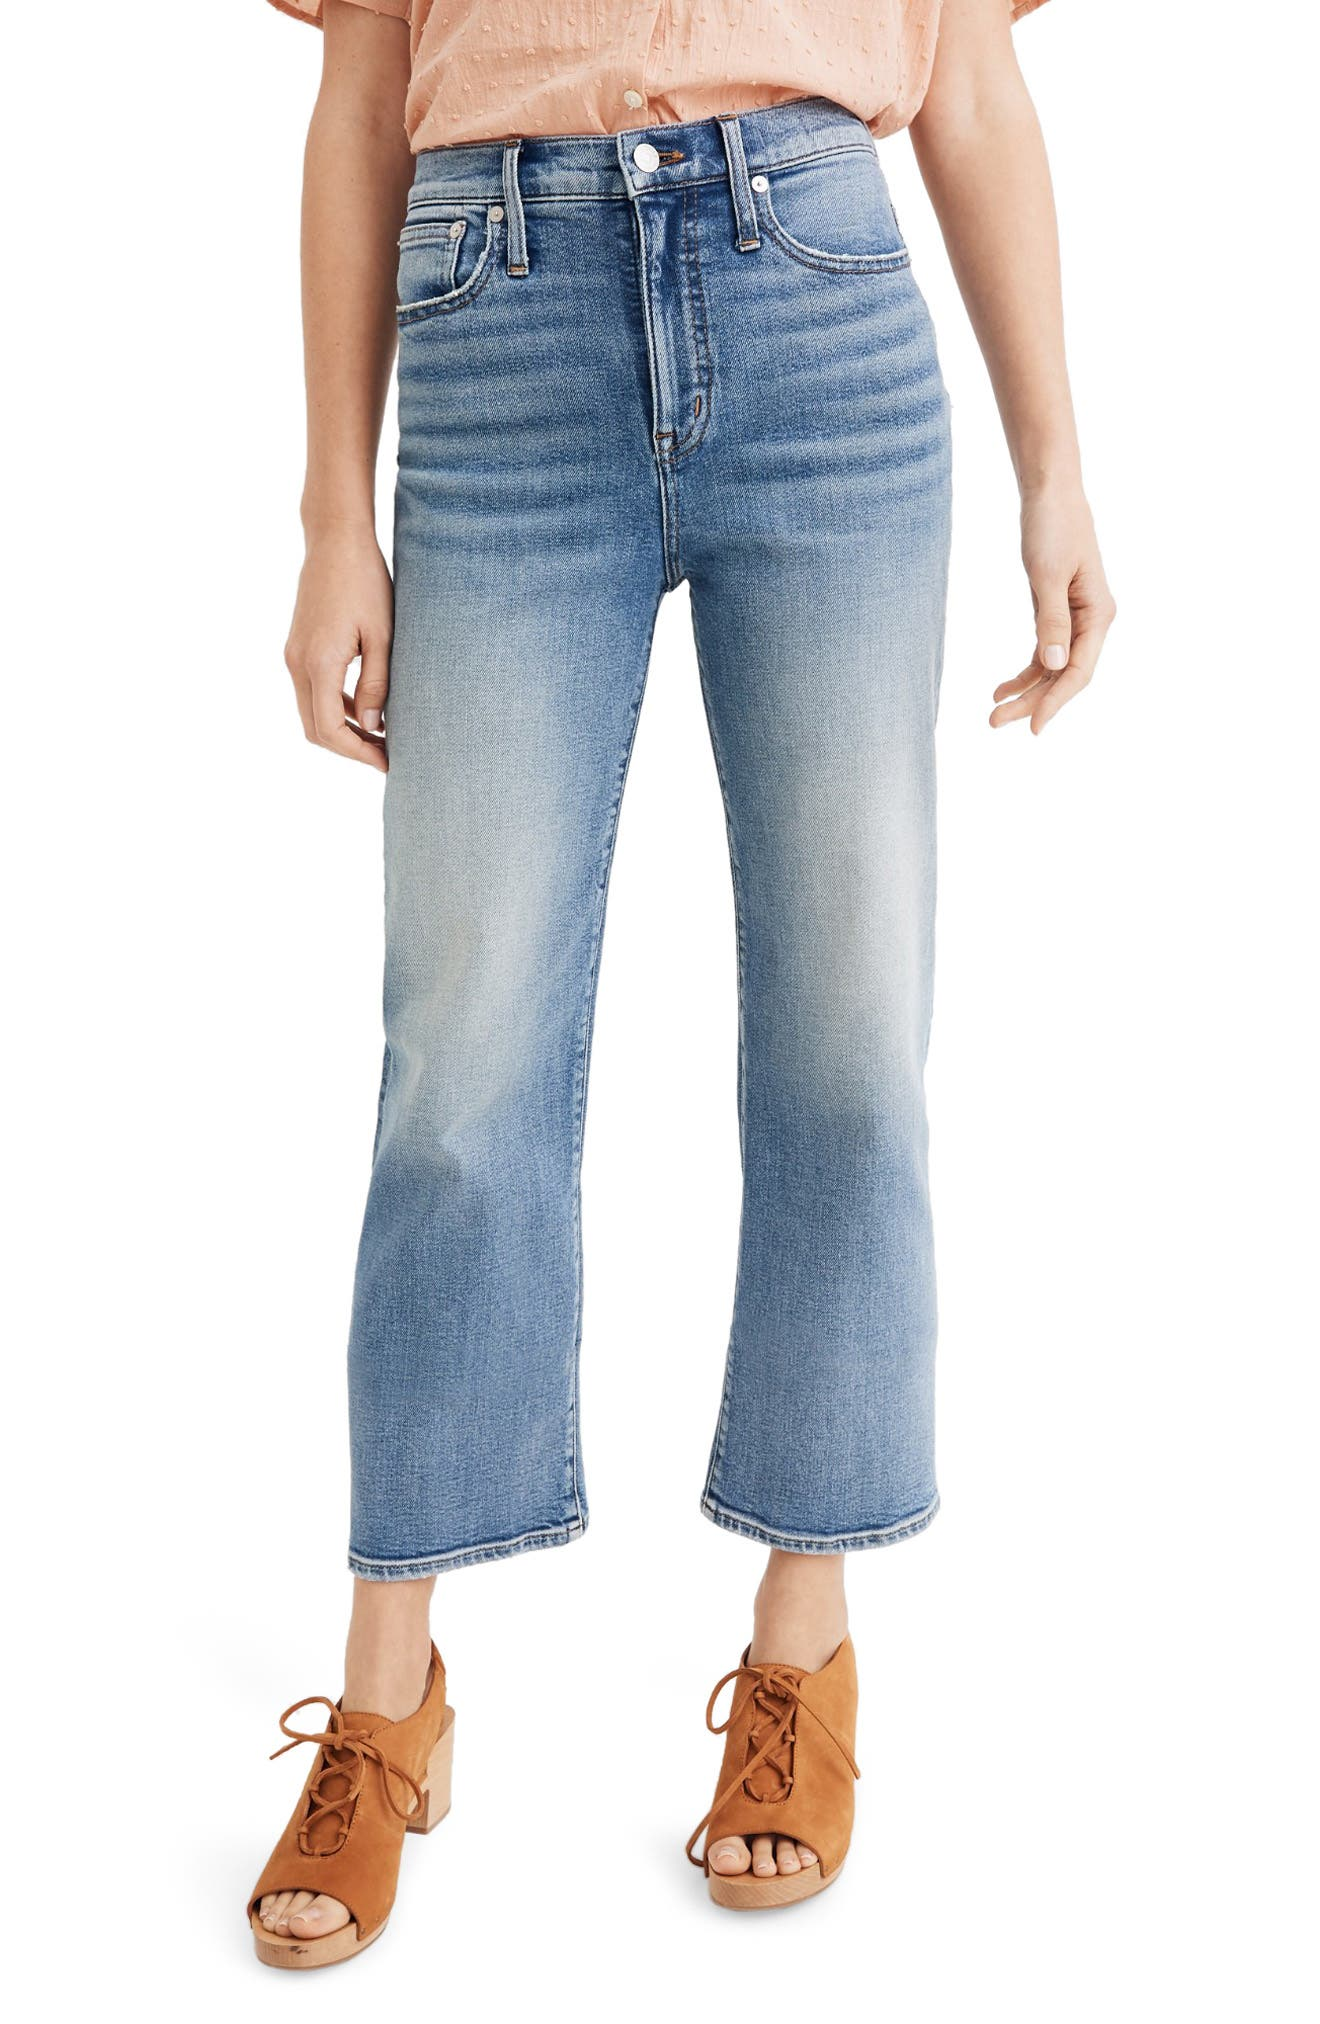 Madewell Slim Wide Leg Crop Jeans (Reggie Wash)   Nordstrom